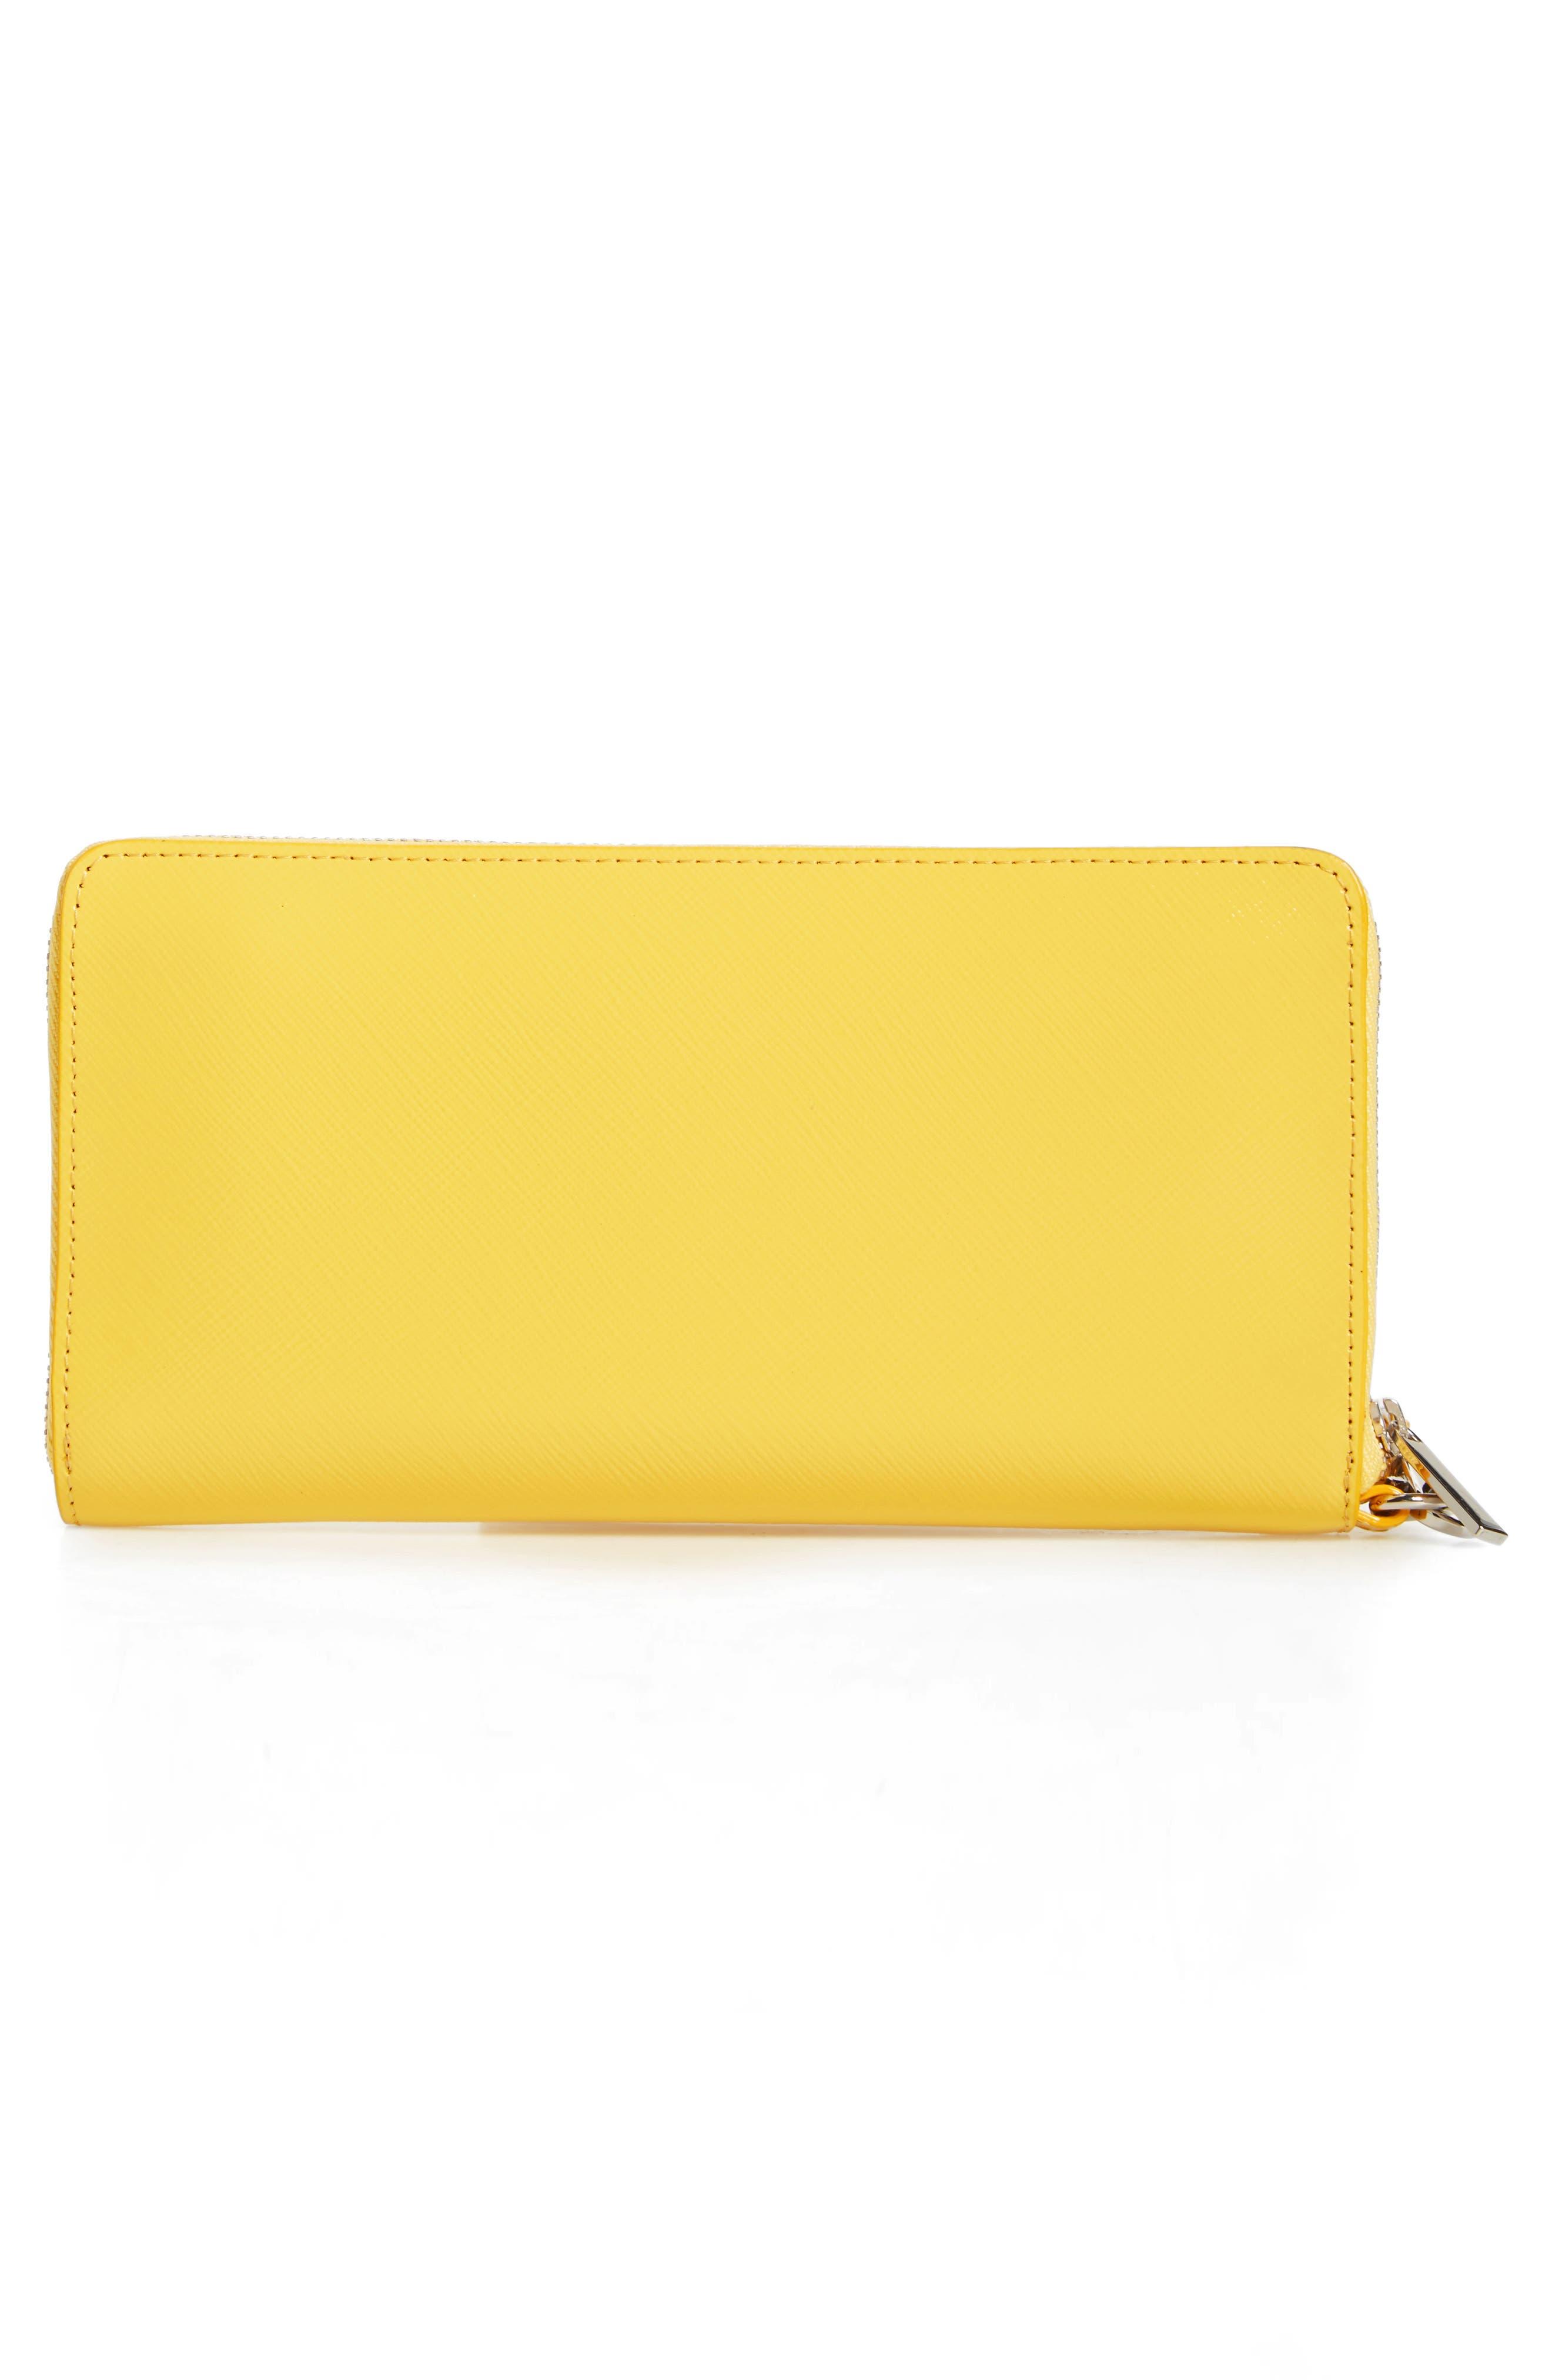 Leather Zip Around Wallet,                             Alternate thumbnail 6, color,                             Yellow Zest